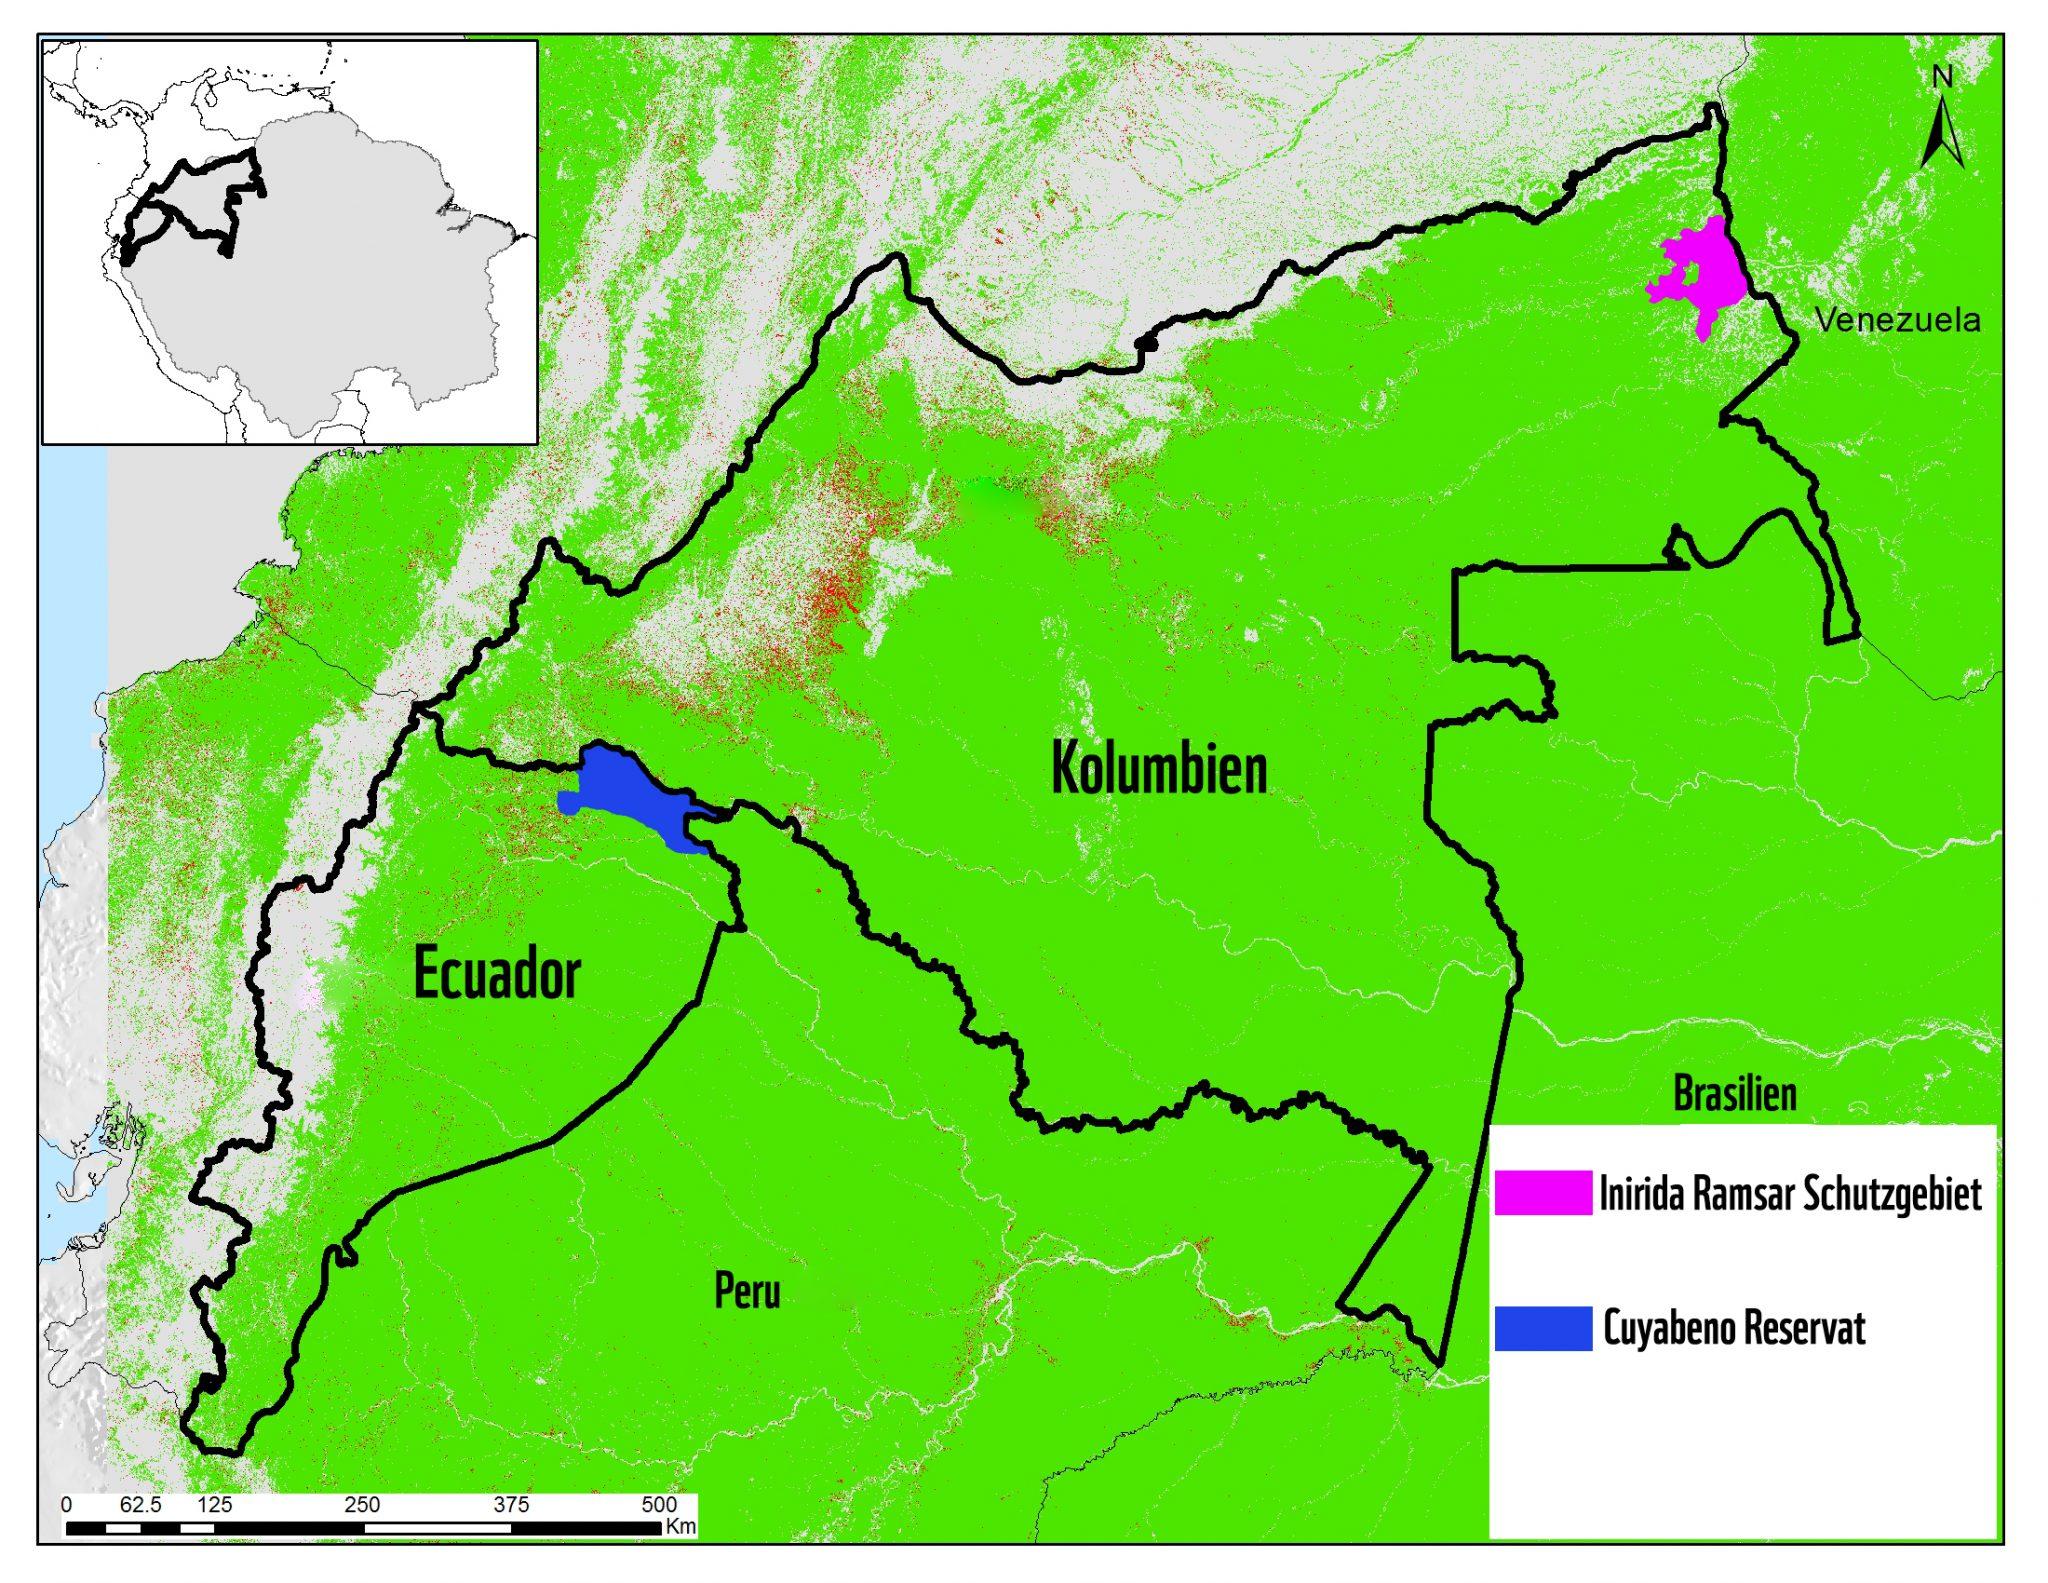 Schematische Karte Nord-Amazonas: Die Schutzgebiete in Kolumbien und Ecuador, in denen die schwarzen Jaguare in die Kamerafallen tappten.